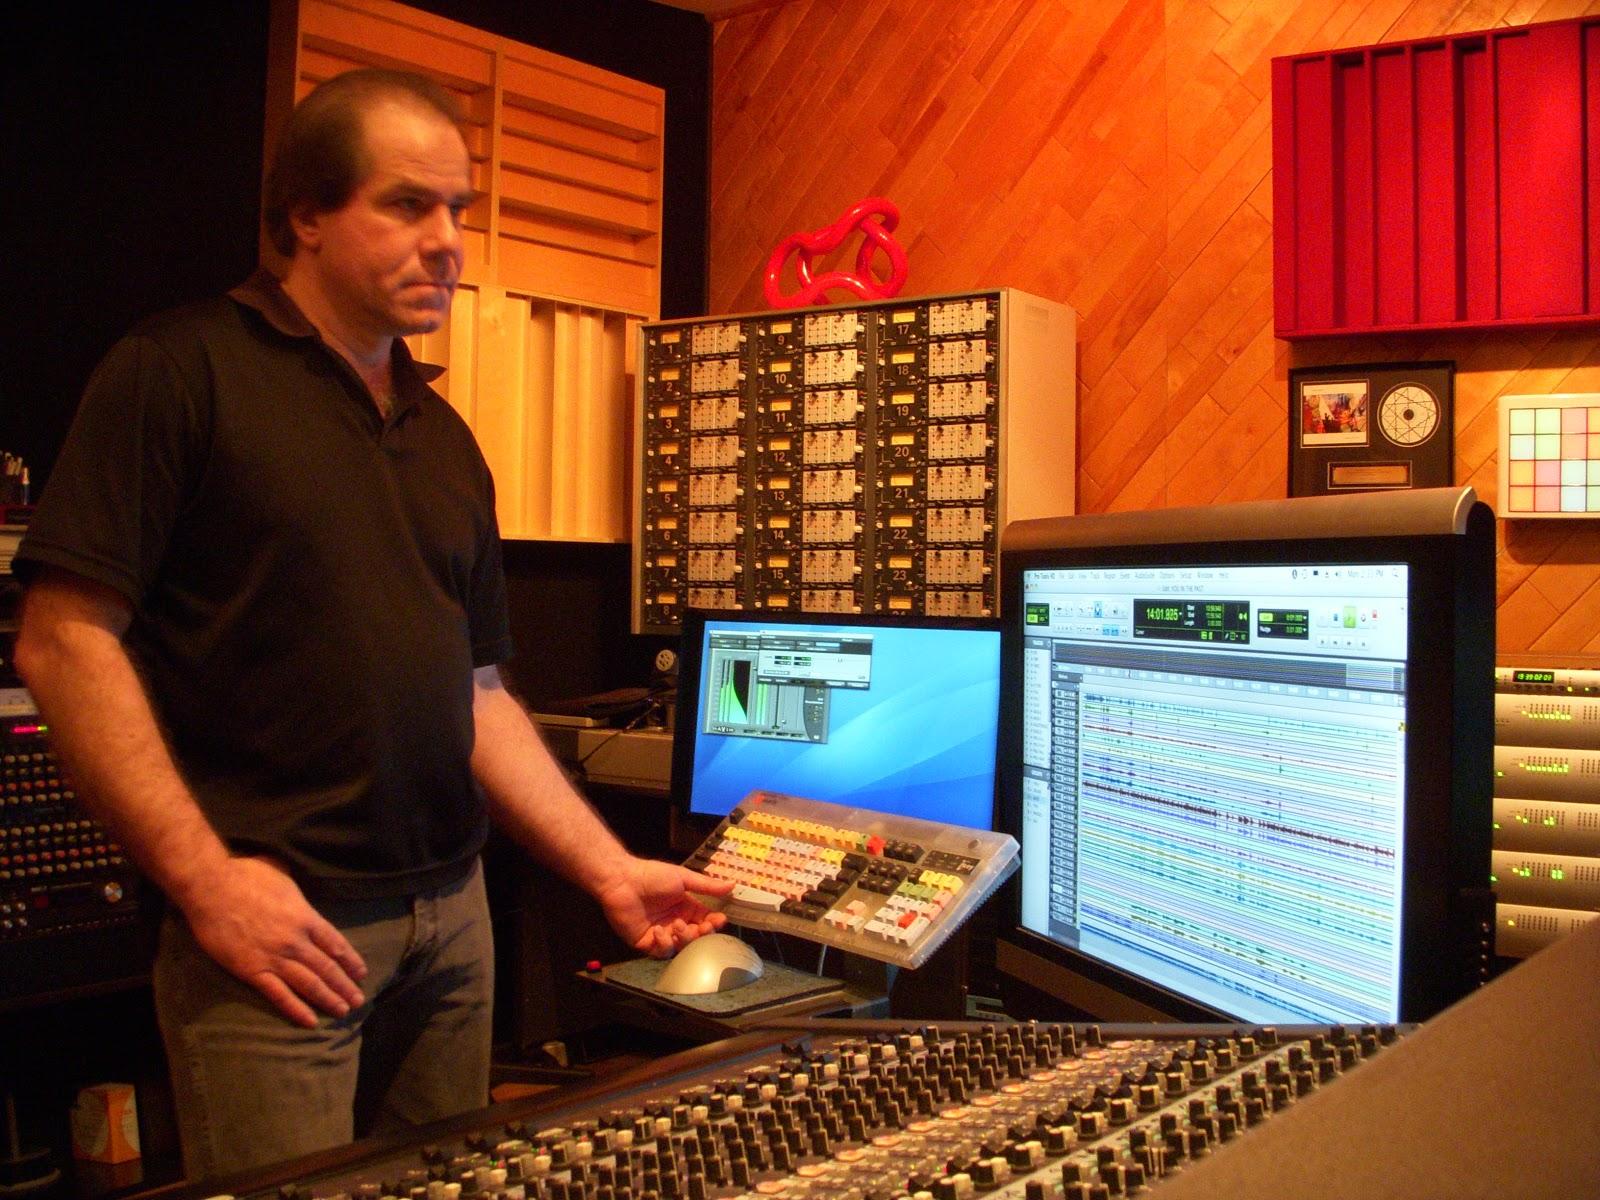 Mike Marciano in studio - 5 Top Classical & Jazz Mix Engineers